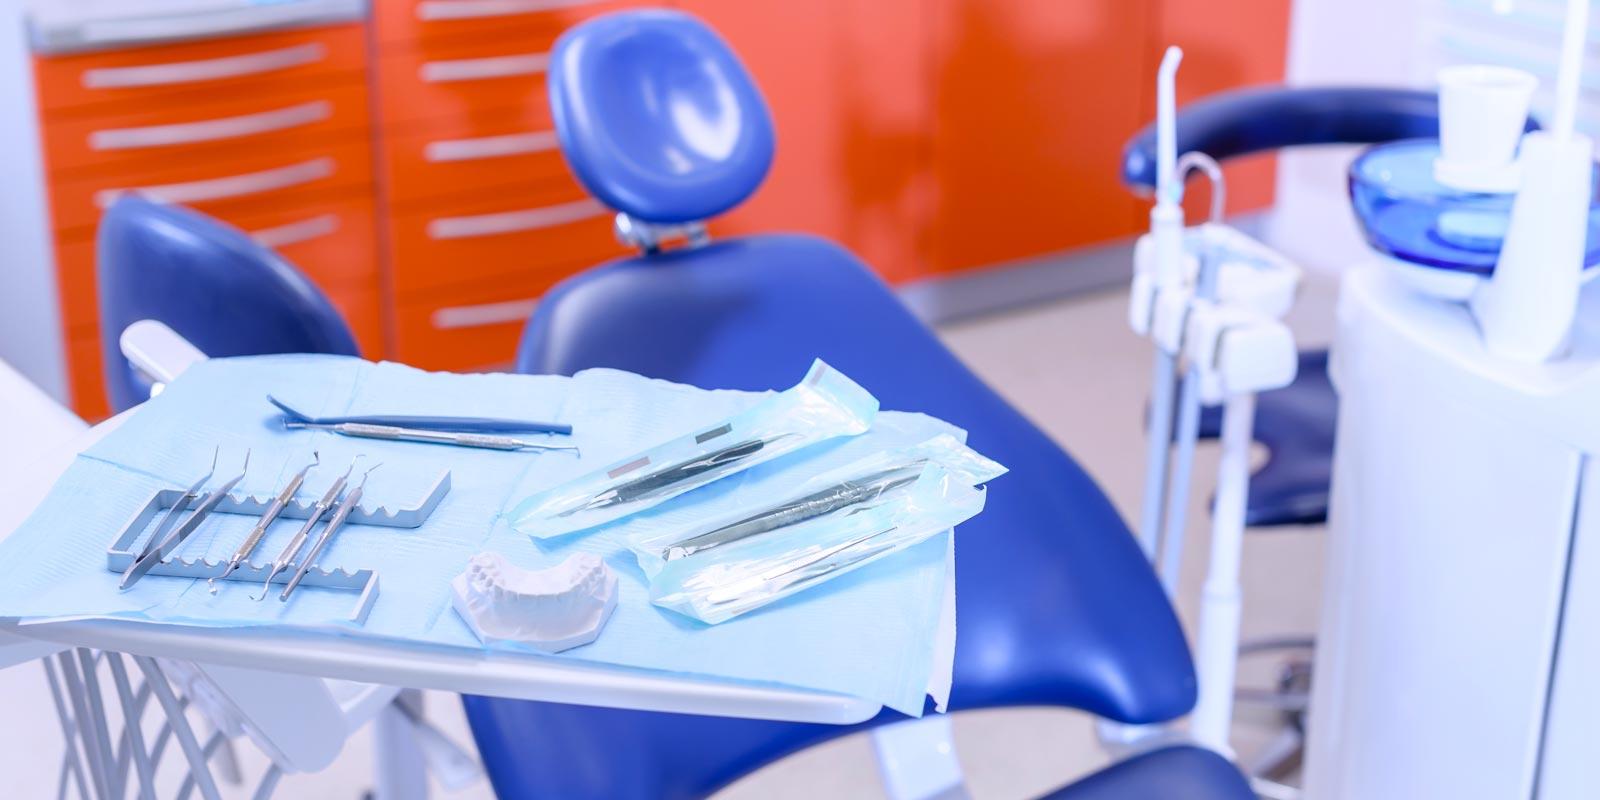 studio-dentistico-dottor-gola-casteggio-odontoiatria-pavia-dentista-implantologia-ortodonzia-protesi-chirurgia-89